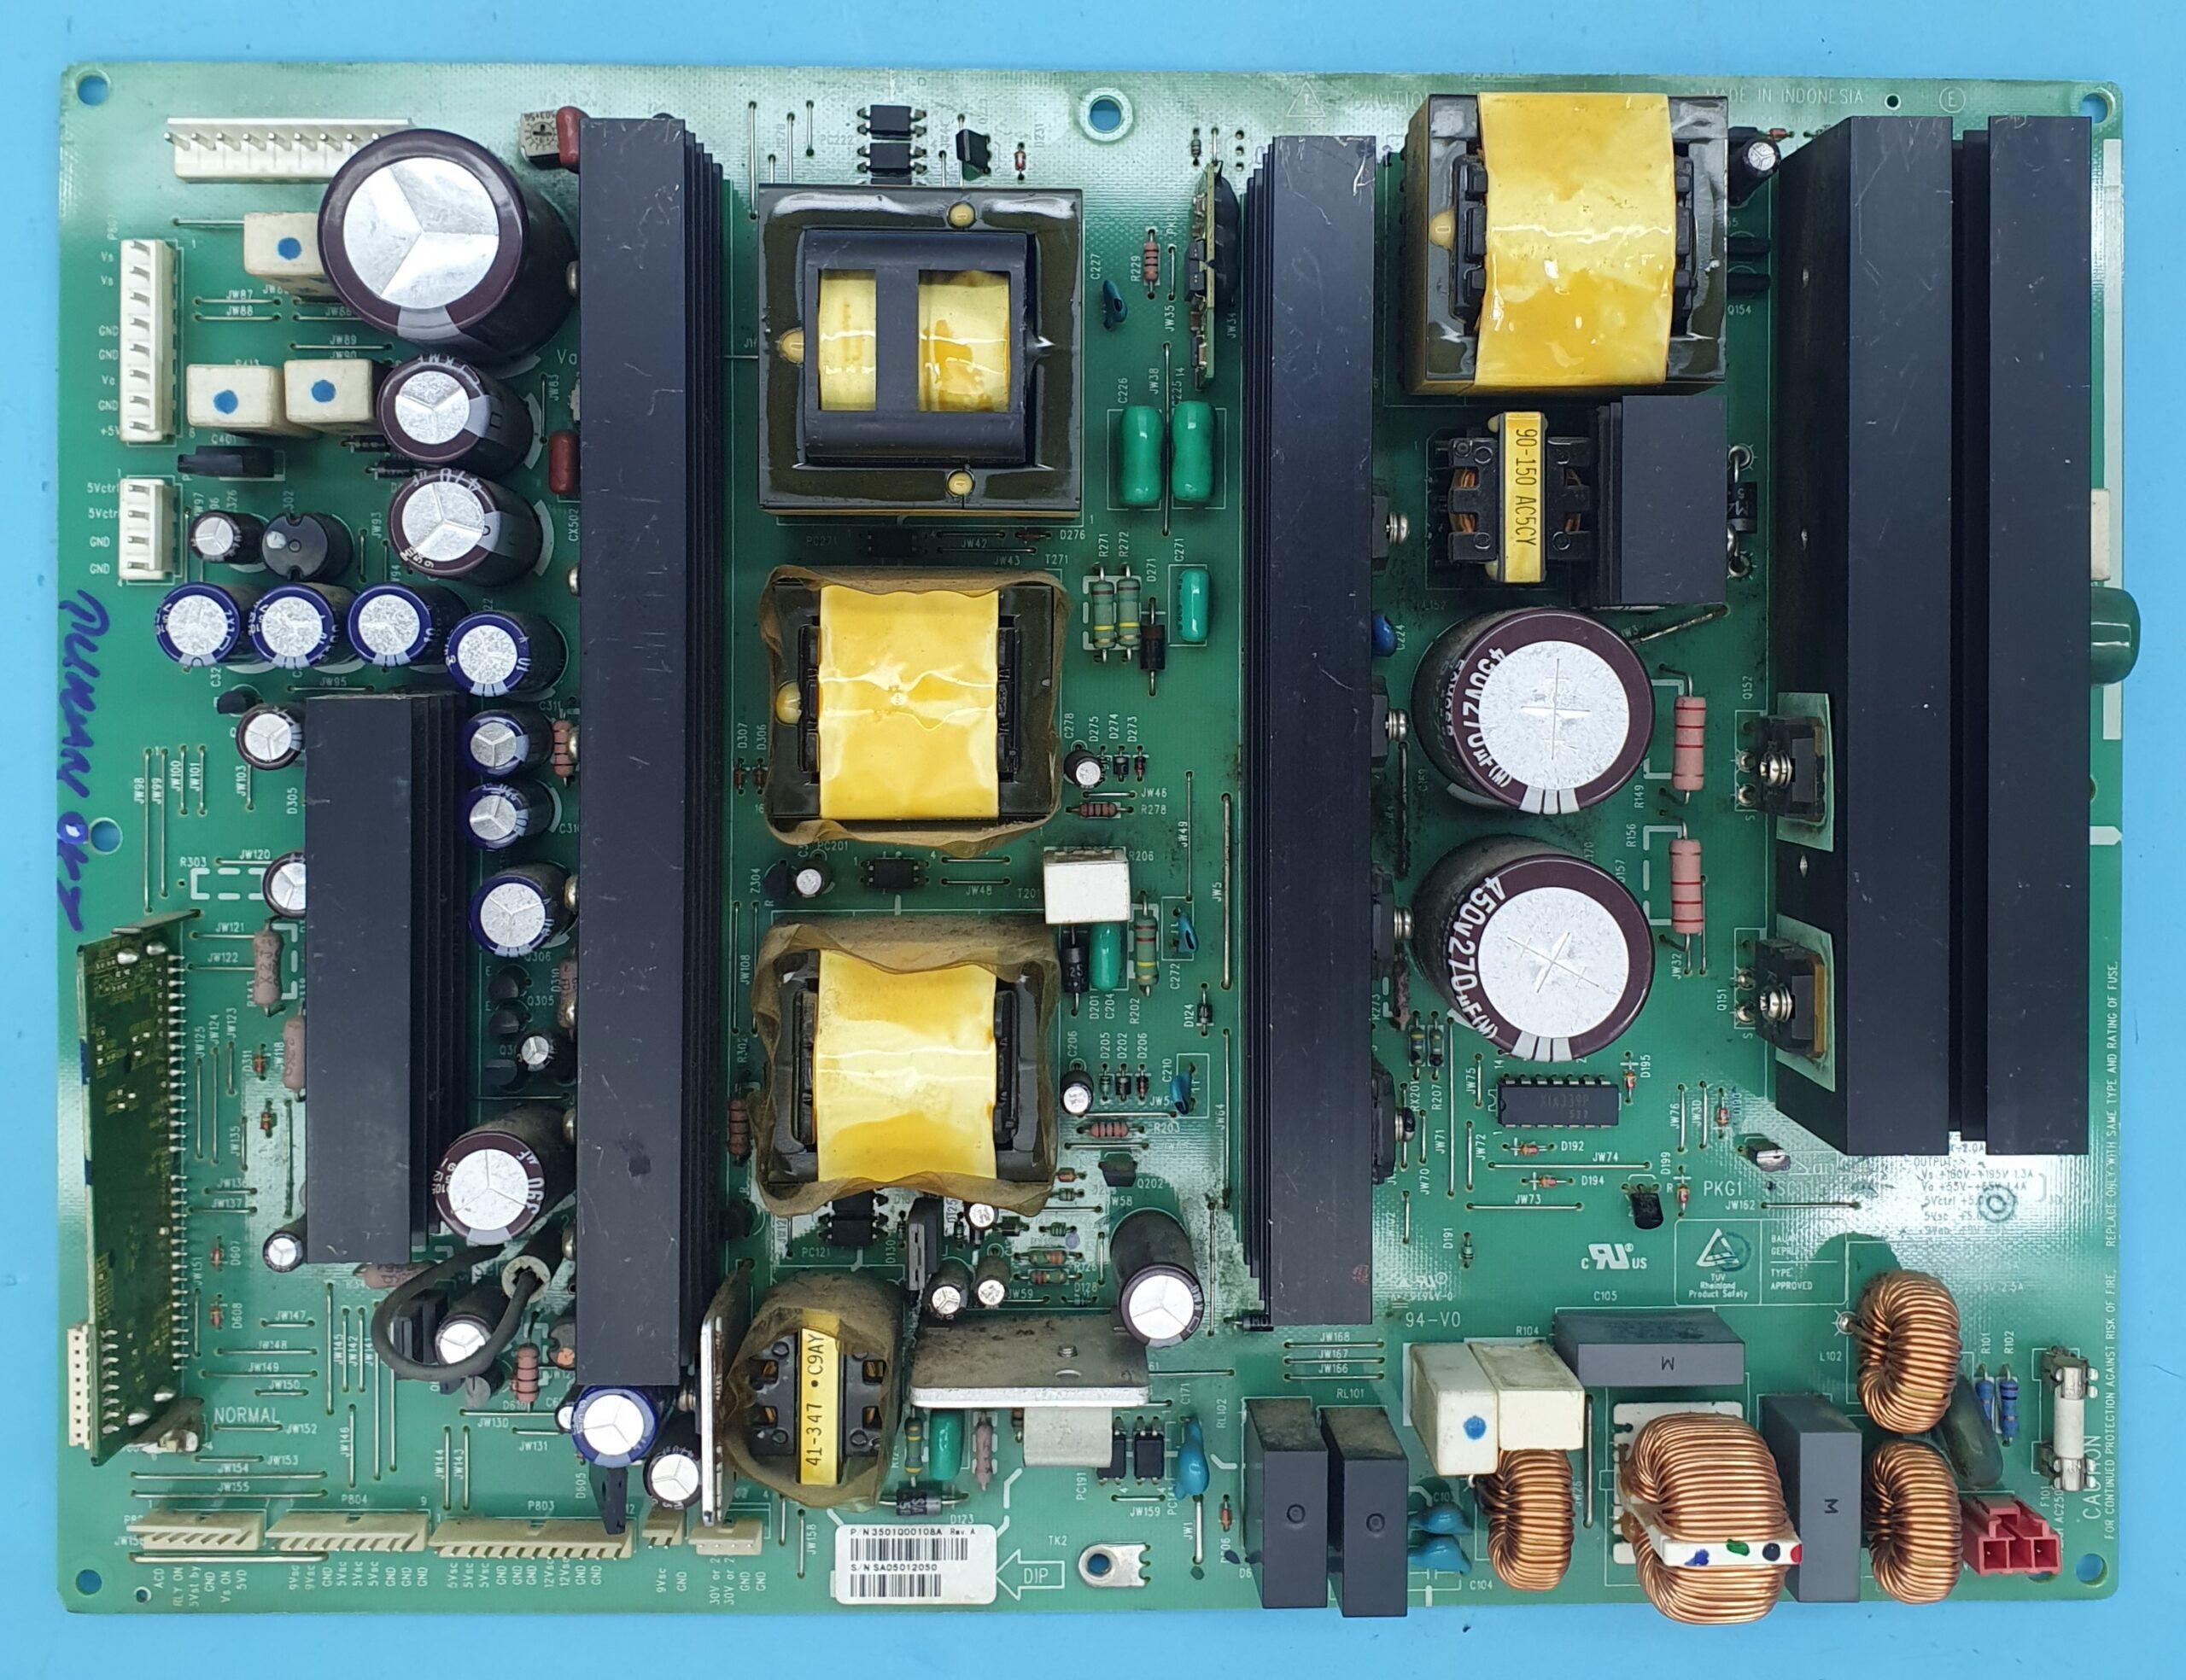 PSC10154C-M Vestel Power (KDV DAHİL = 130 TL)